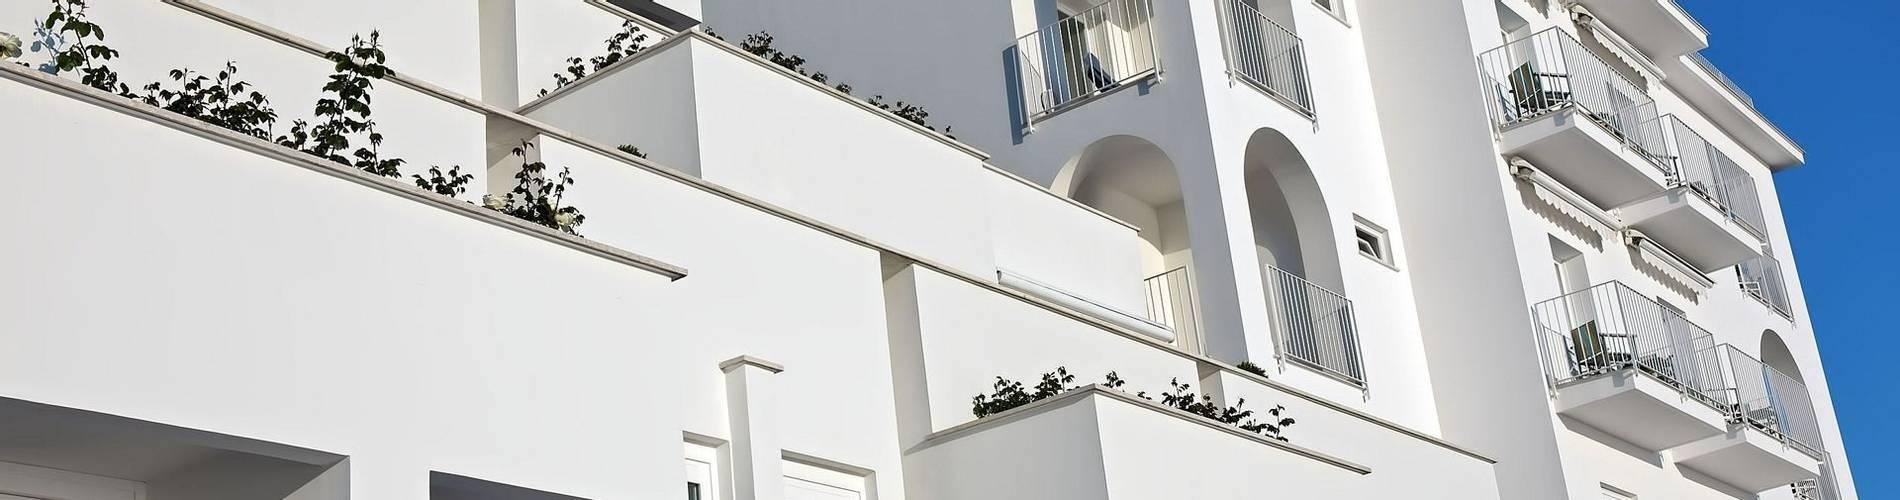 Casa Angelina esterno_2.jpg